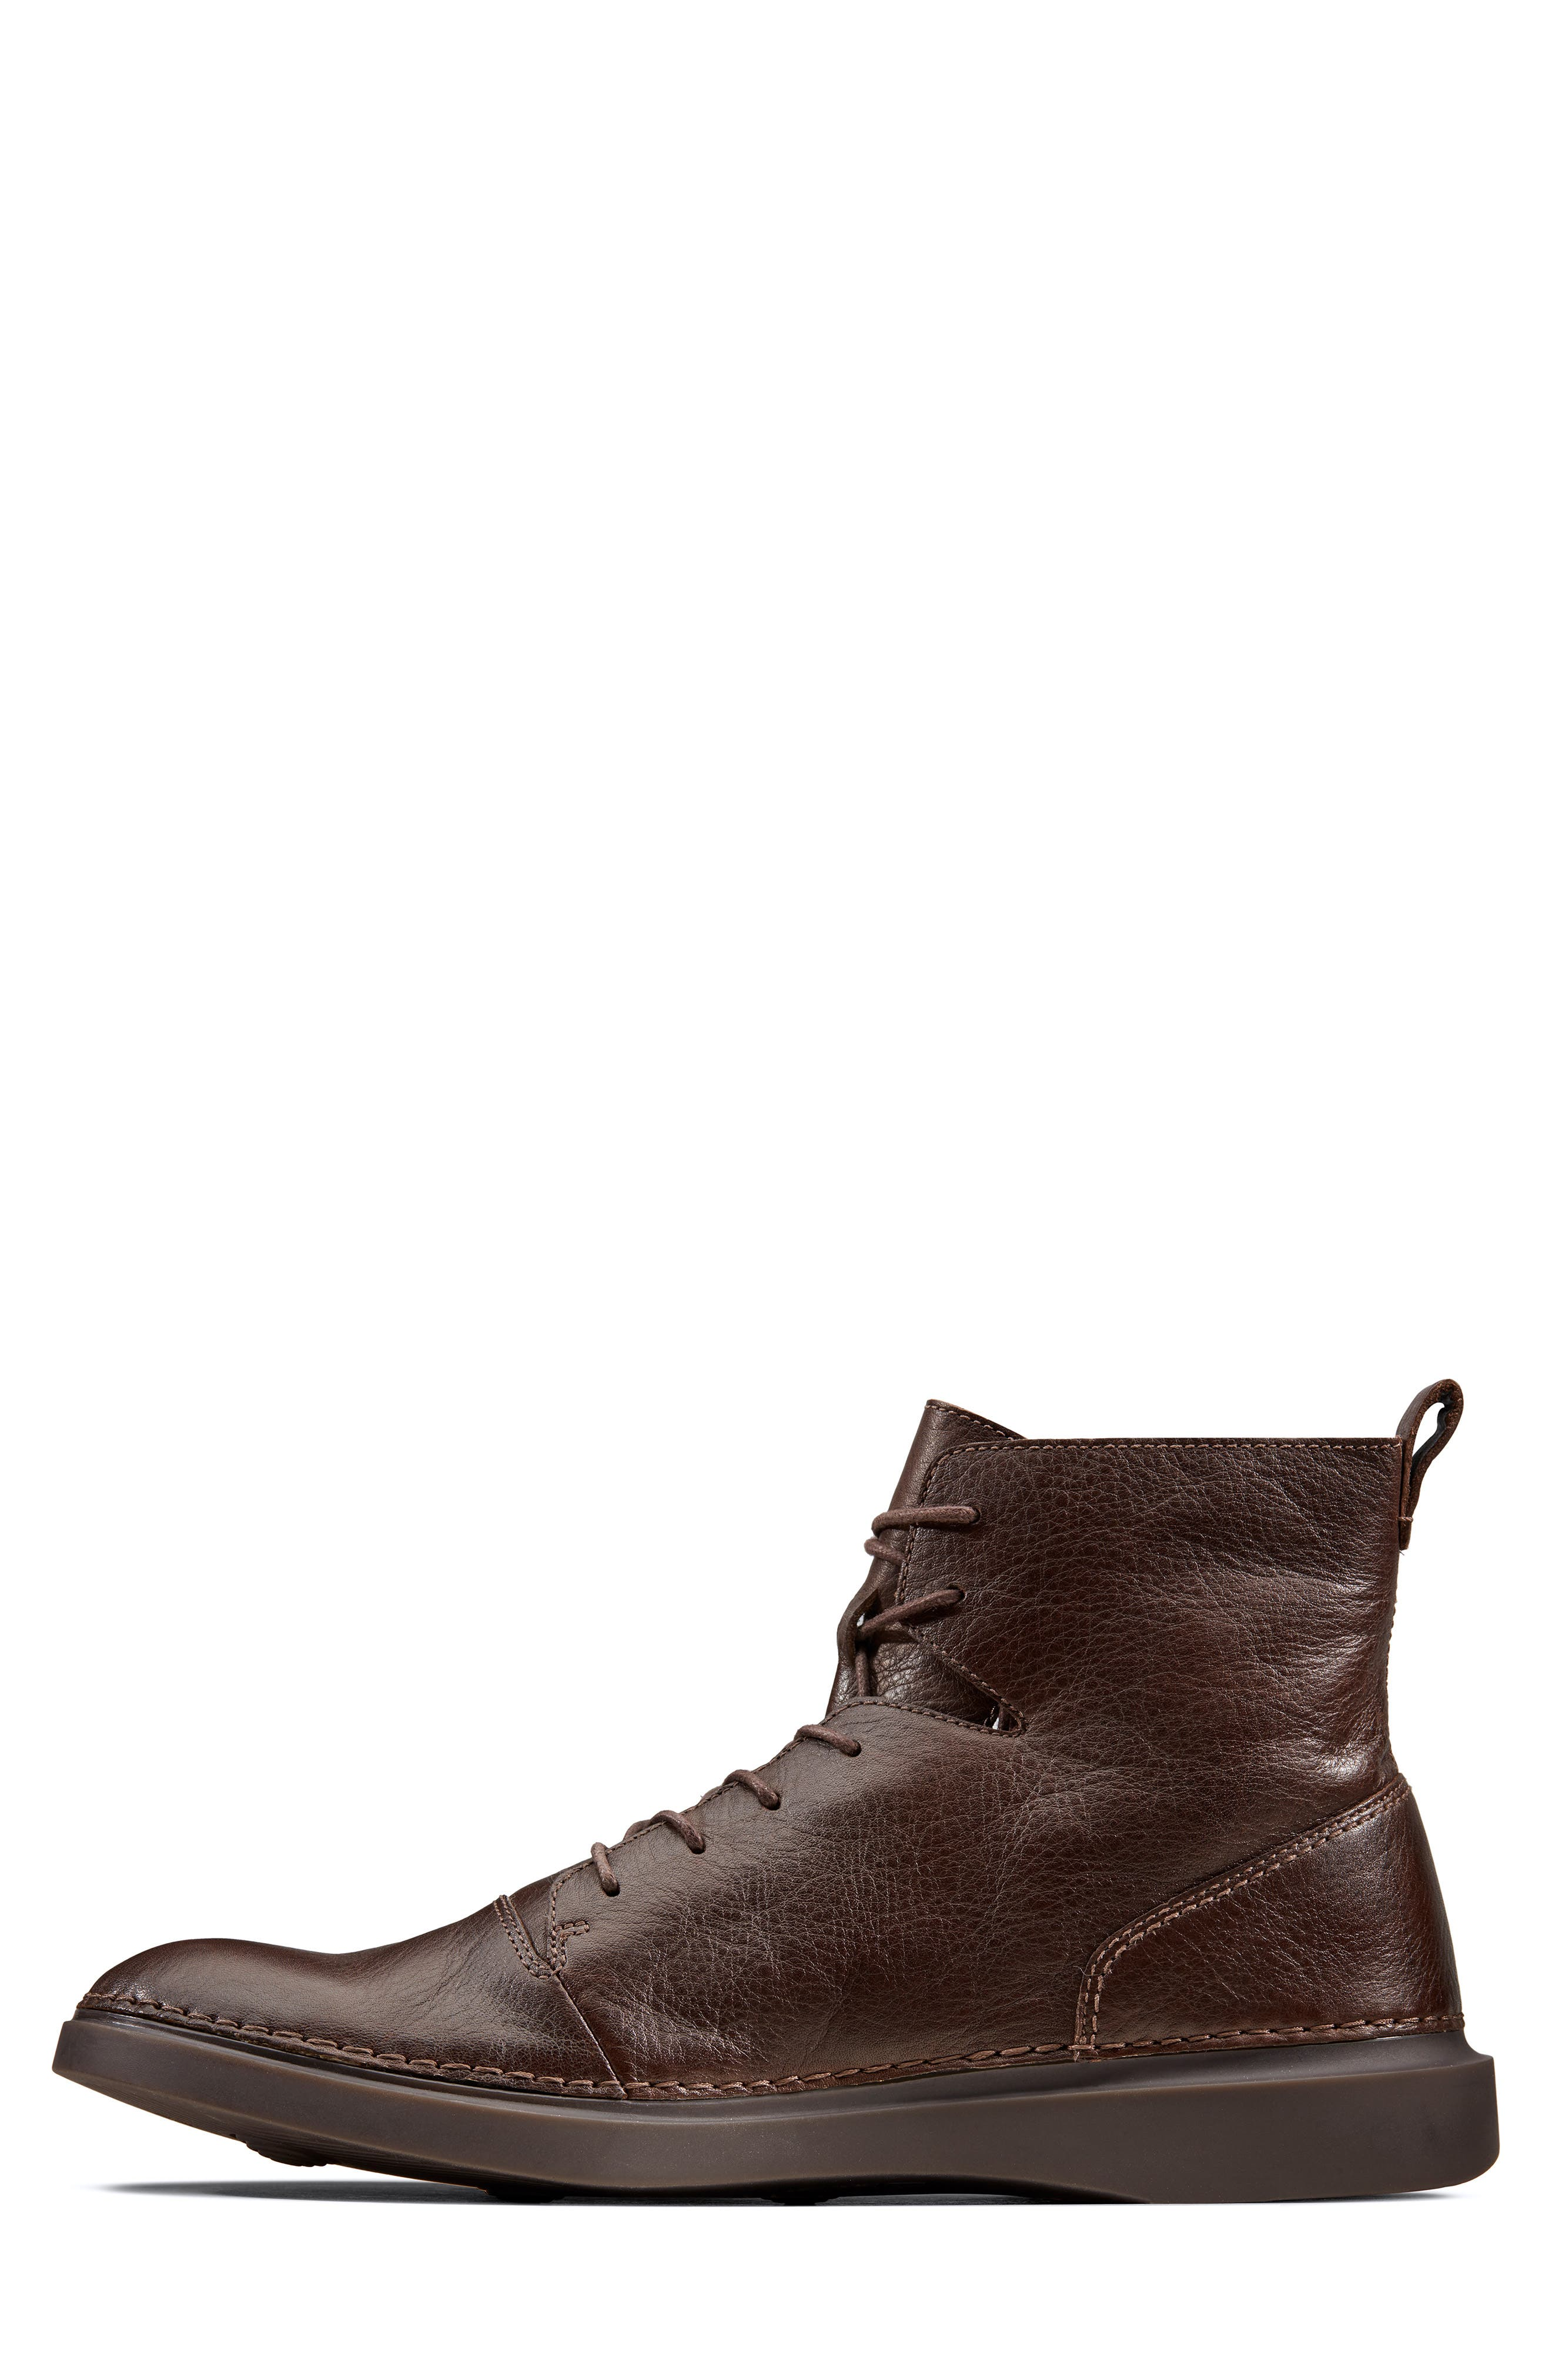 Hale Rise Plain Toe Boot,                             Alternate thumbnail 7, color,                             213